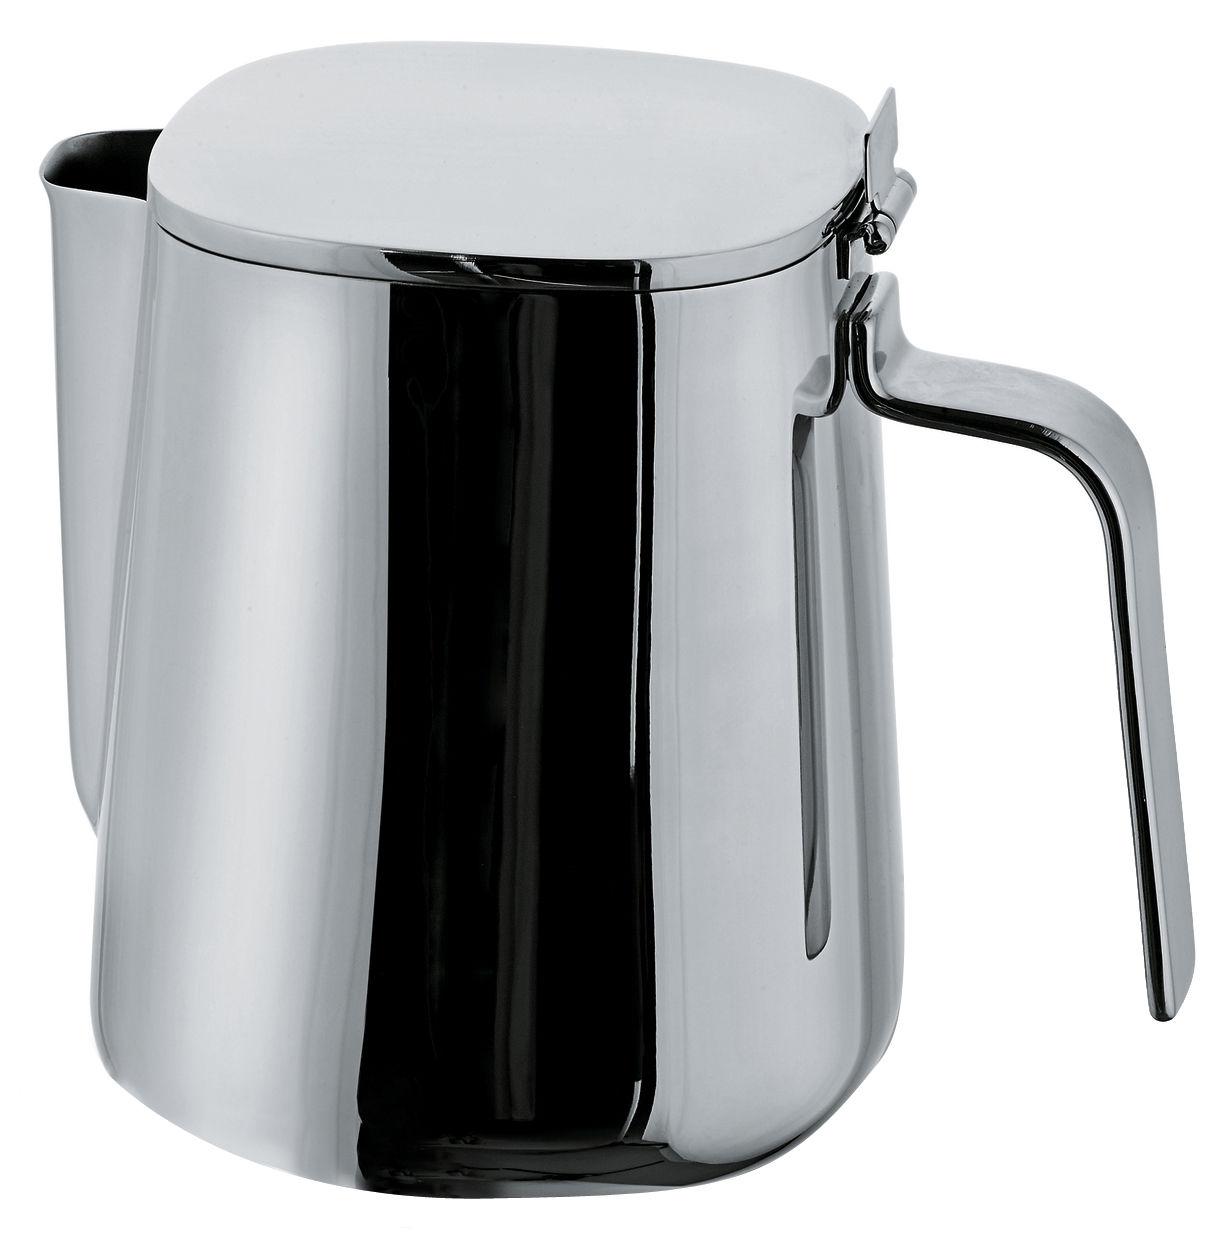 Arts de la table - Thé et café - Pot à café 401 - A di Alessi - 4 tasses - Acier inoxydable